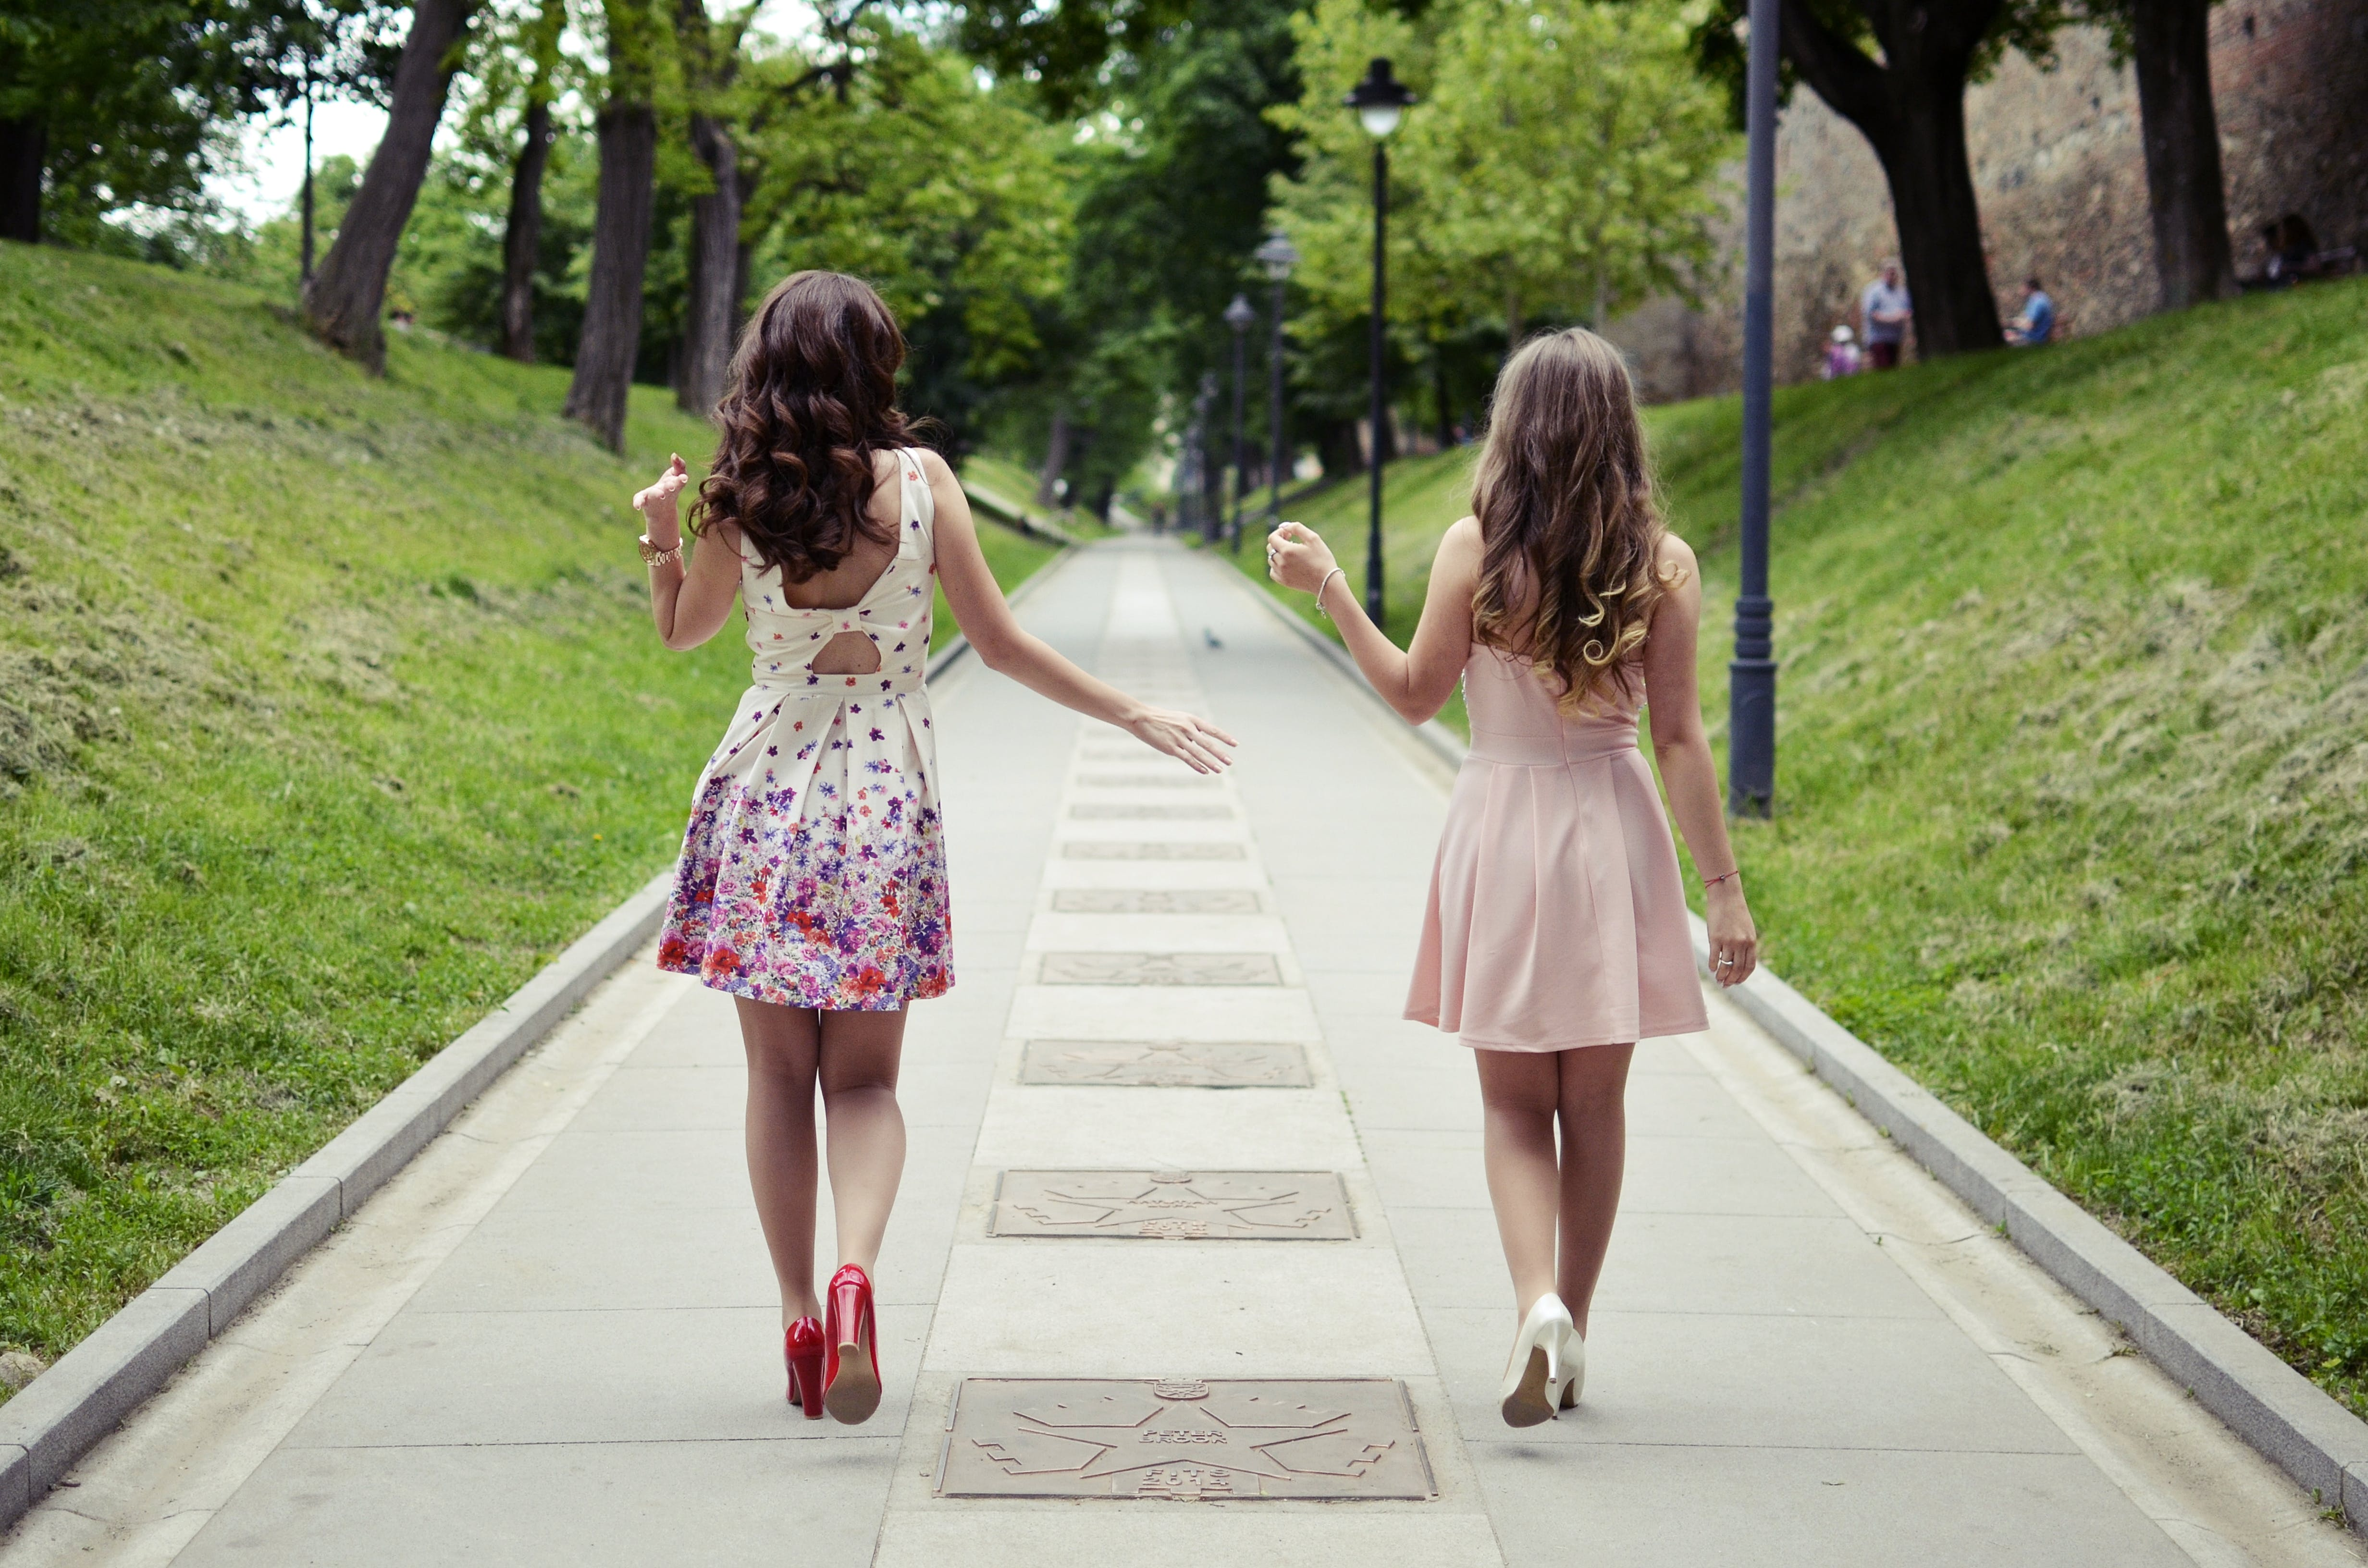 Two Women Walking On Pathway